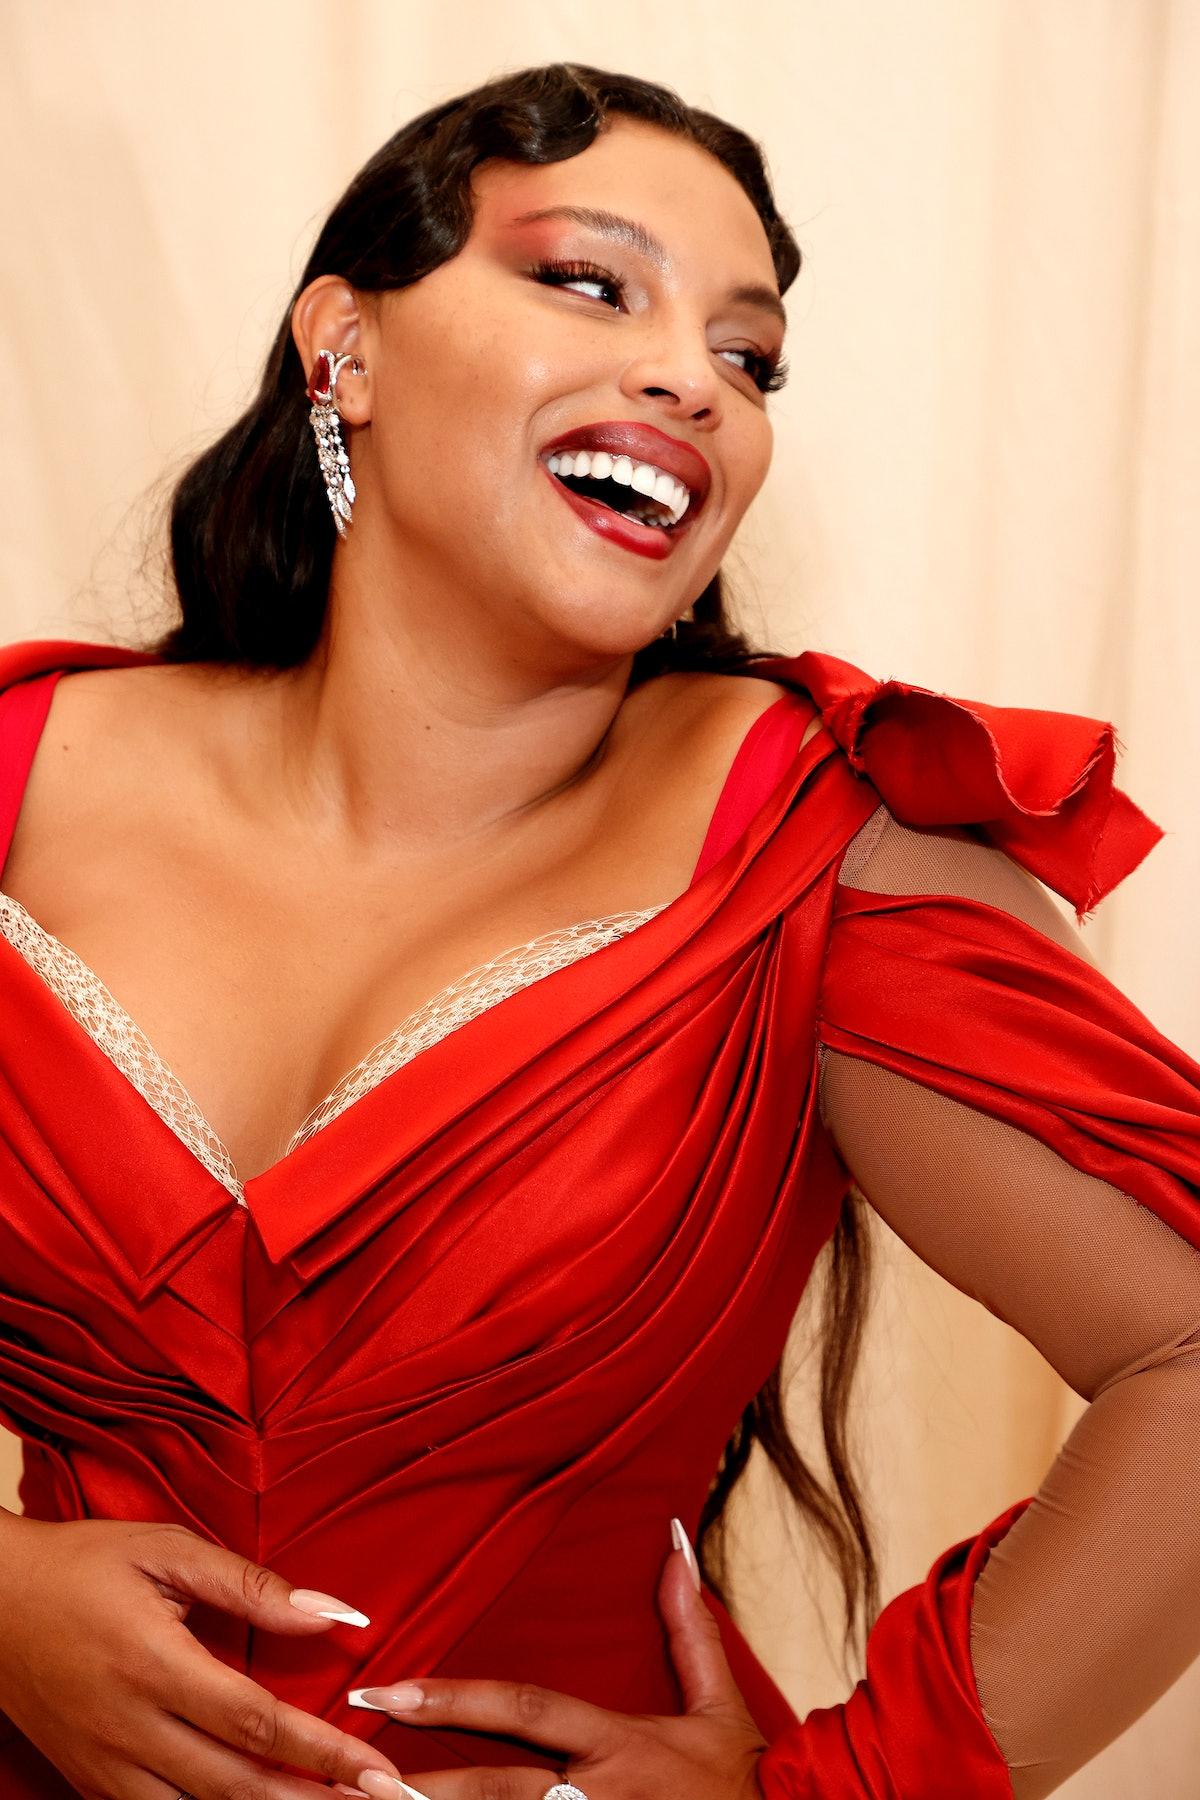 نیویورک ، نیویورک - 13 سپتامبر: پالوما السرسر در جشن مت 2021 در آمریکا شرکت کرد: ...